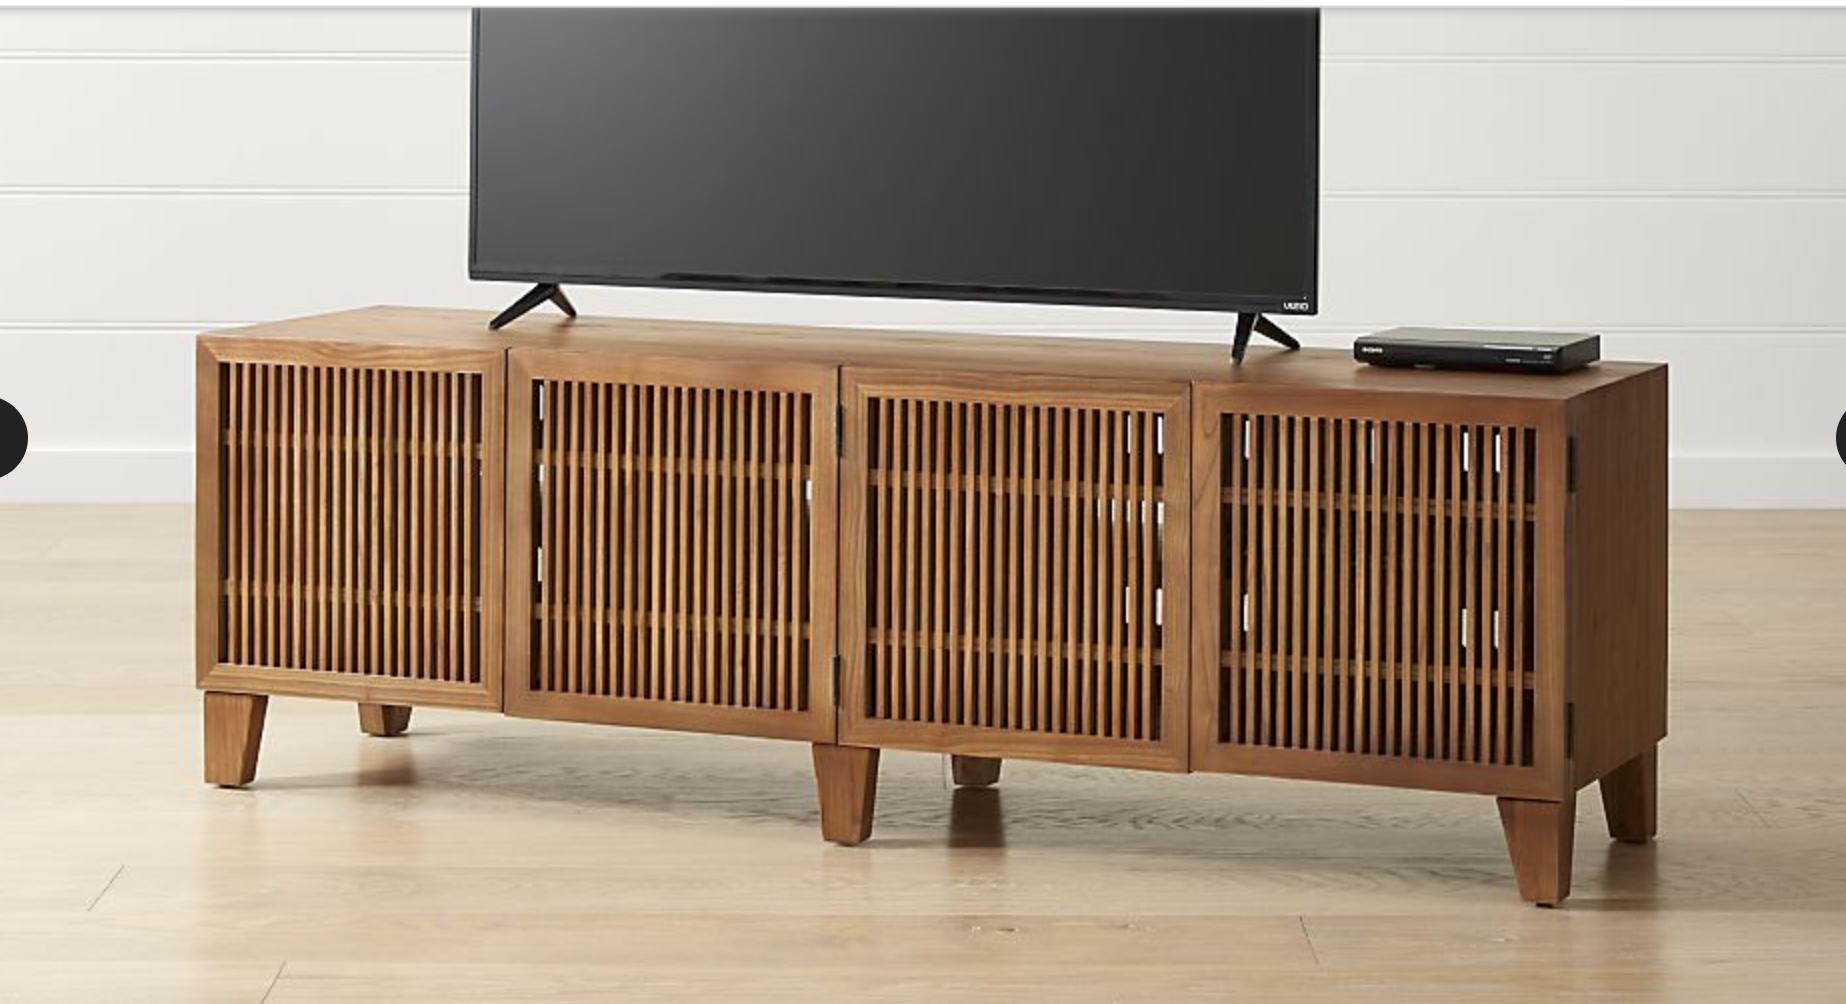 Idea by Steph J on Living Room Living room furniture